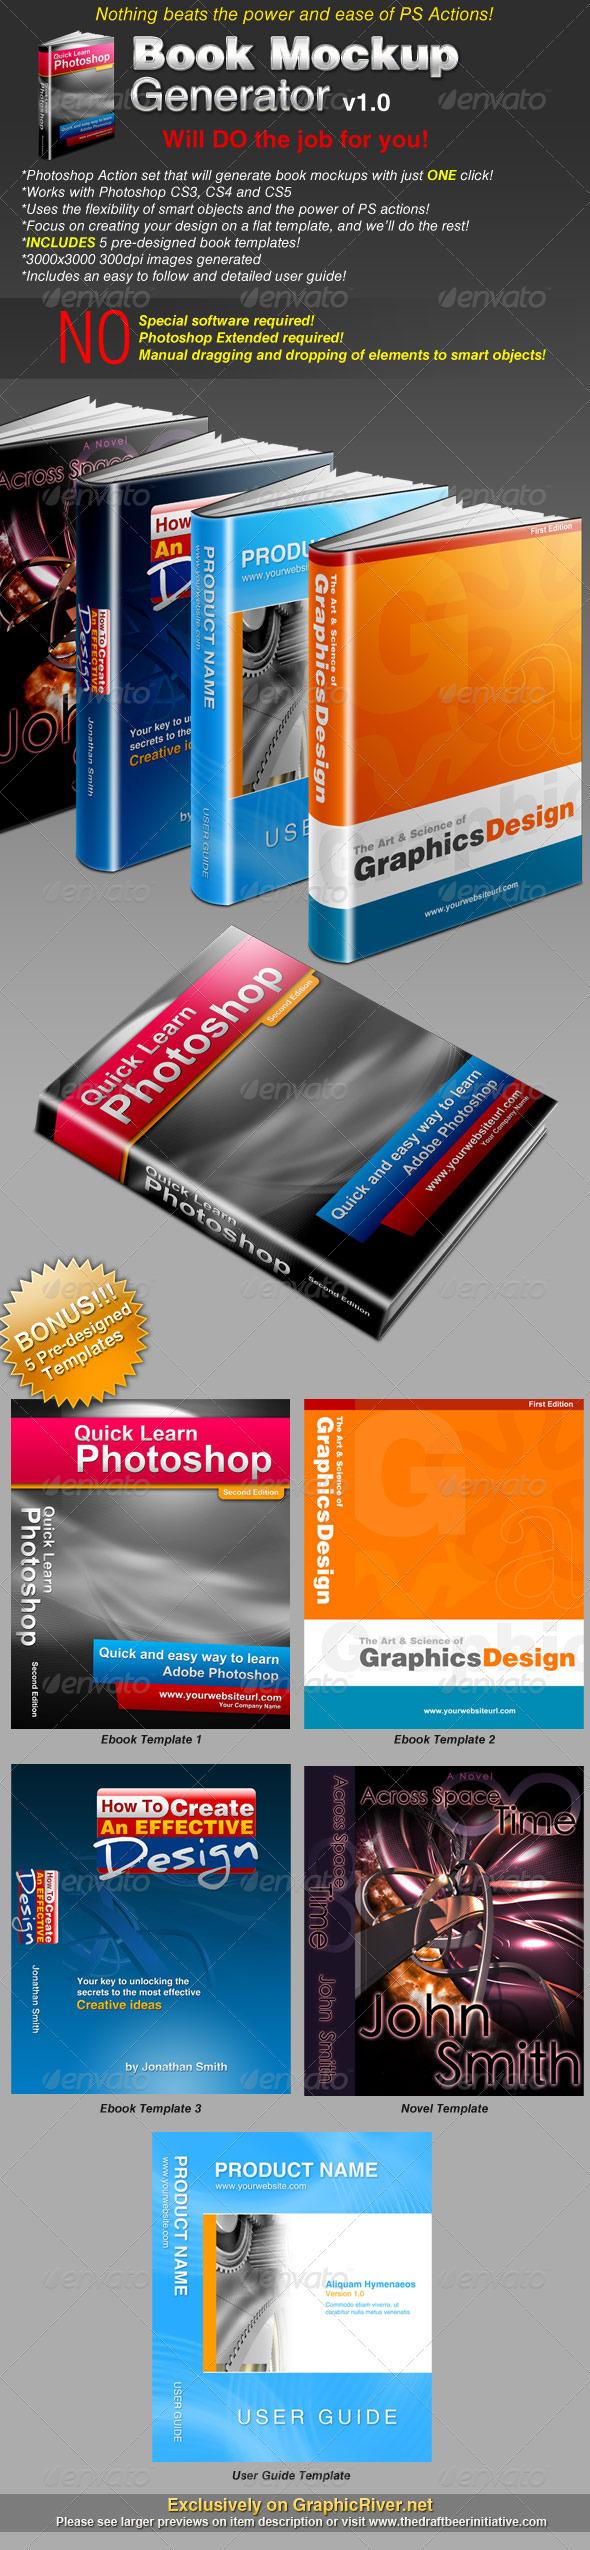 GraphicRiver Book Mockup Generator v1.0 Actions & Templates Set 112751